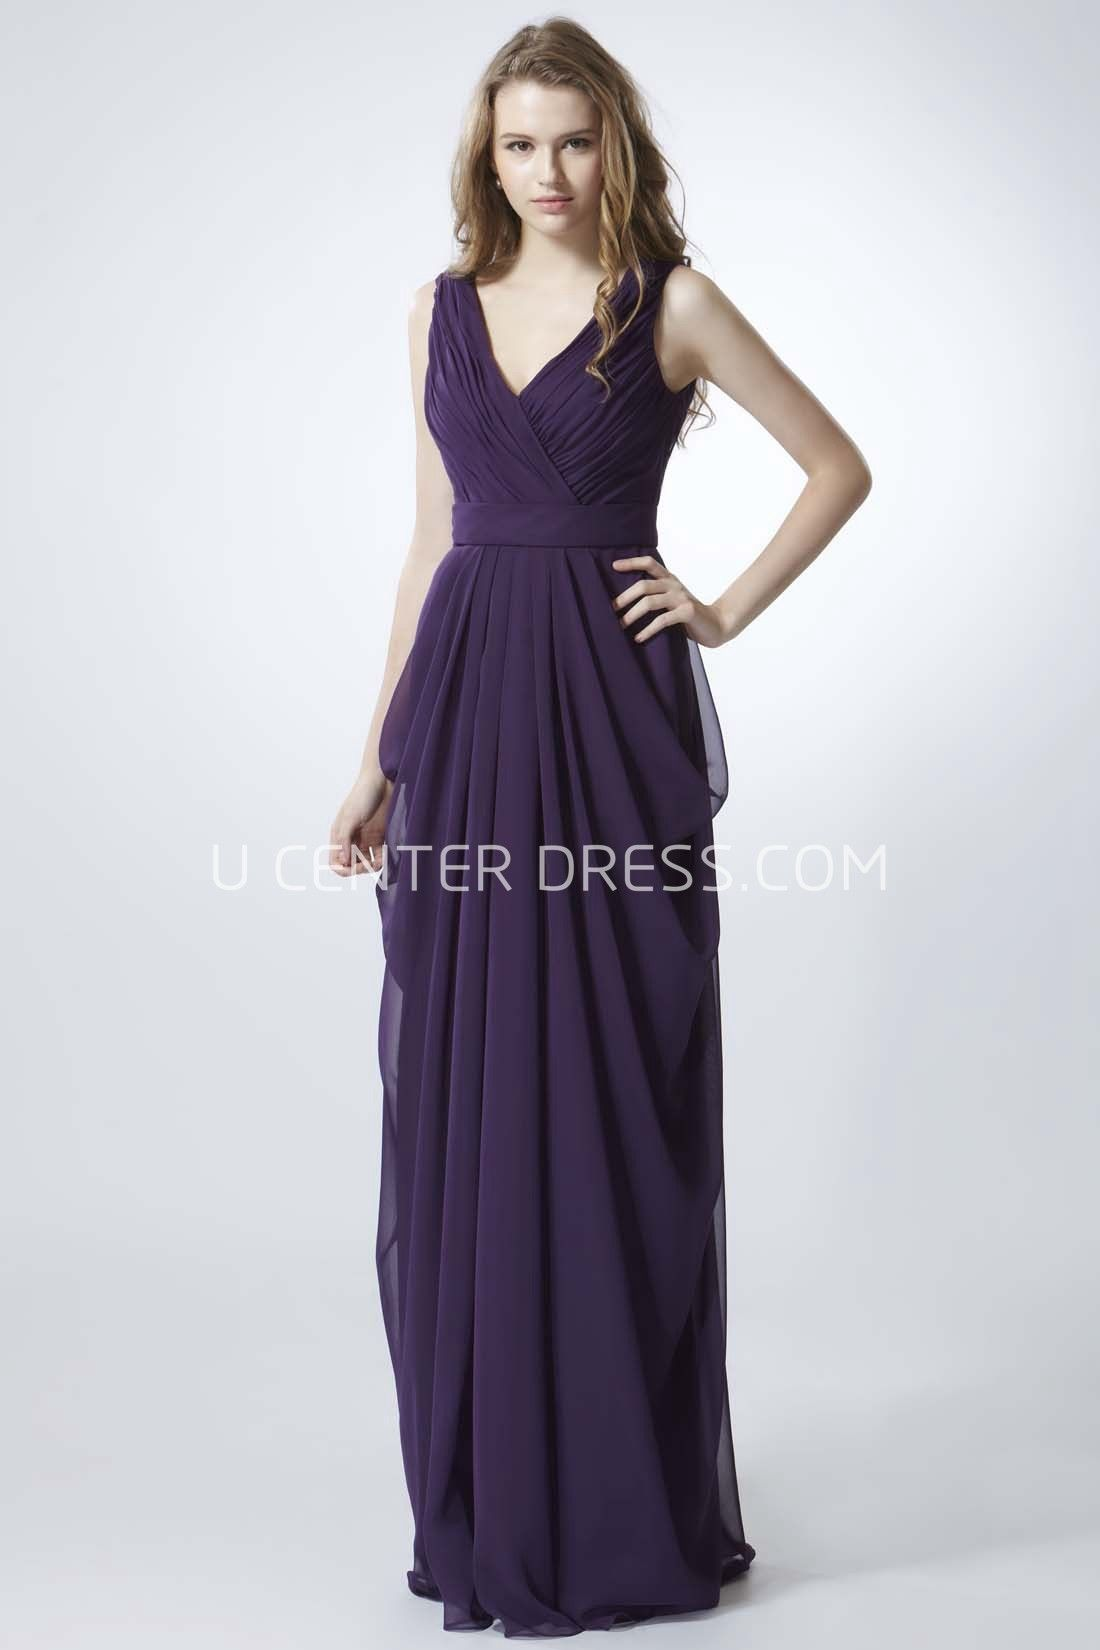 31874578c0d US 95.69-Sheath Sleeveless V-Neck Chiffon Long Purple Bridesmaid Dress.  http